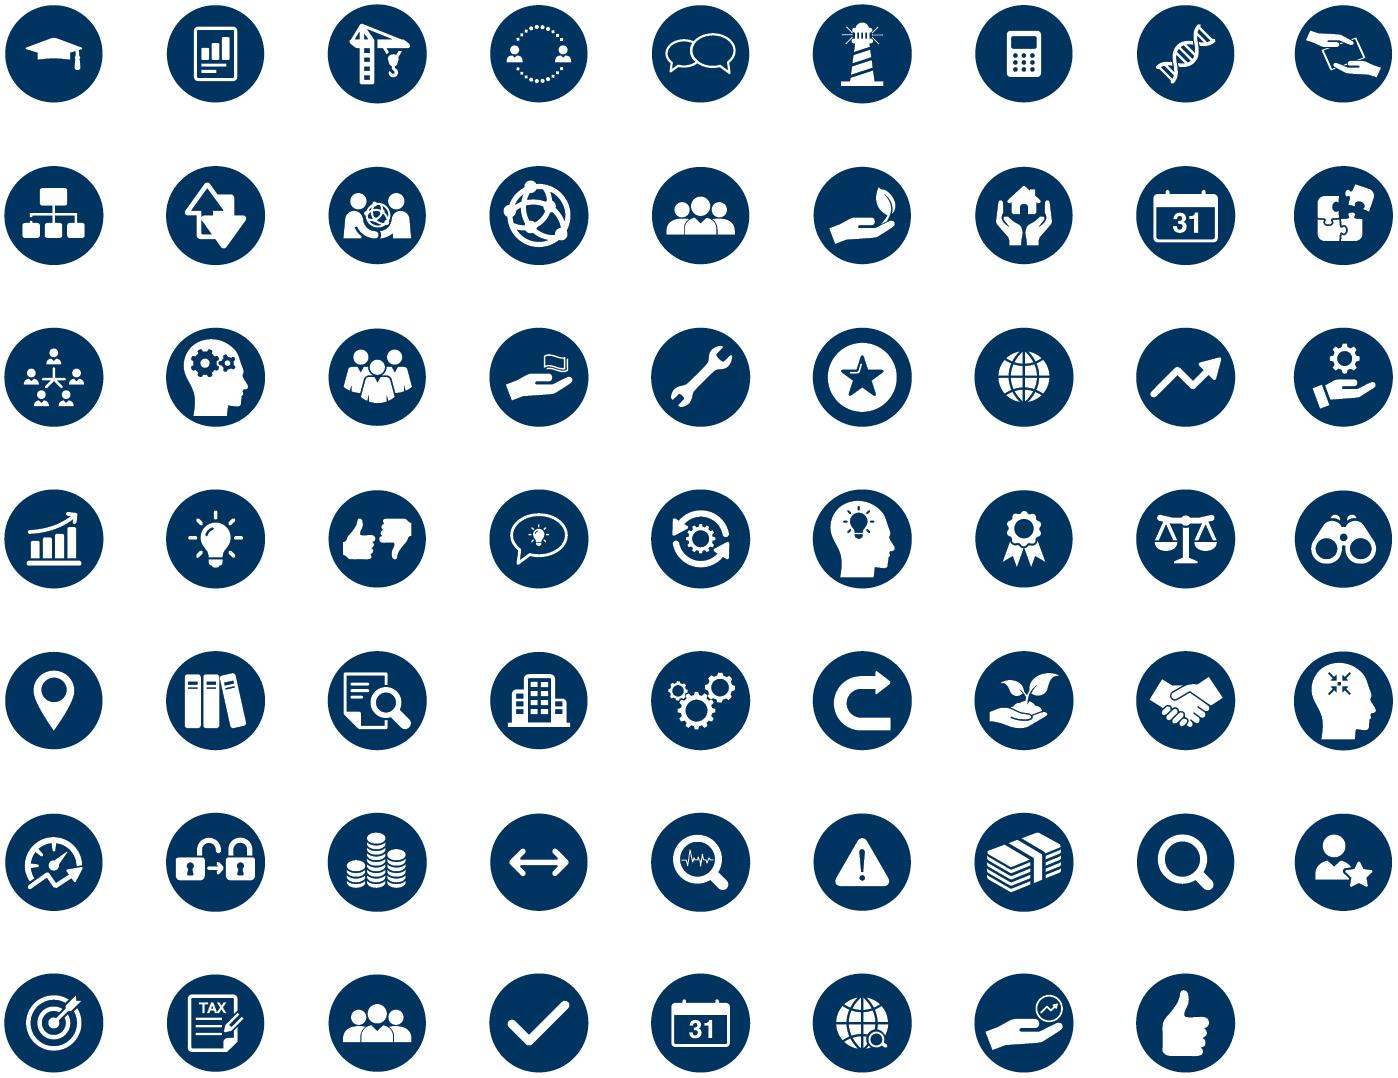 Triton Icons